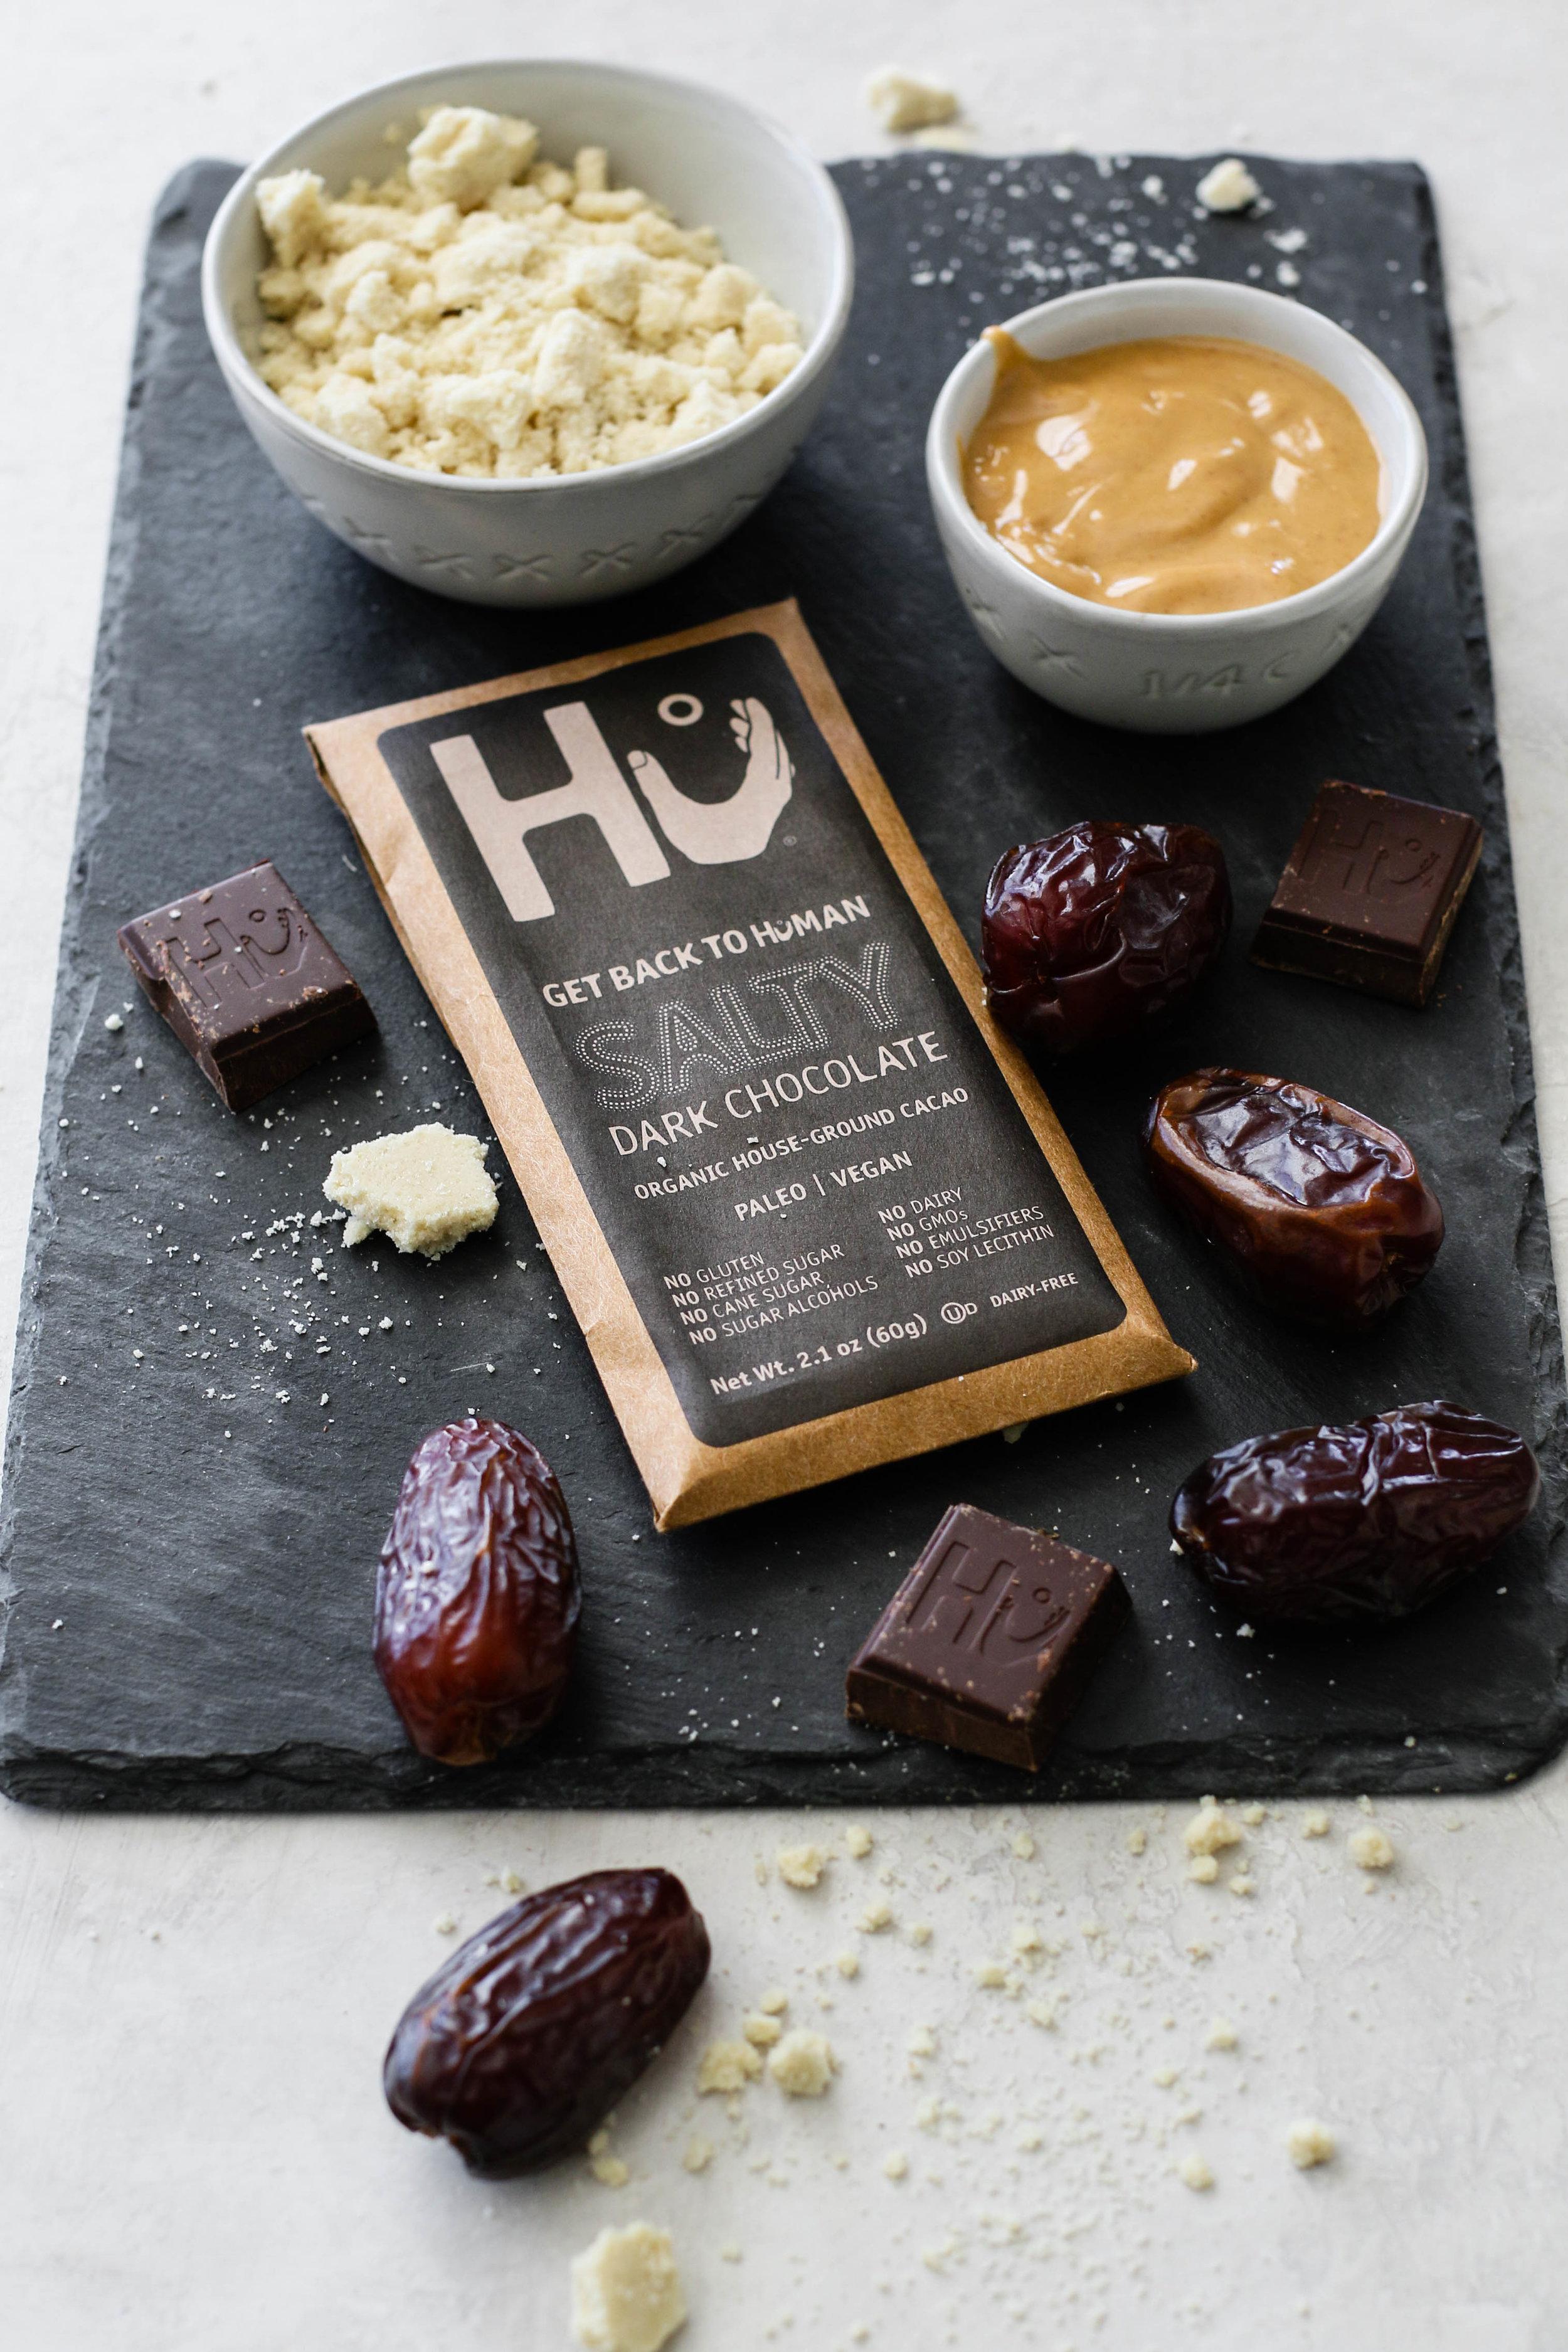 Hu-chocolate-raw-vegan-gluten-free-twix-bars_2.jpg